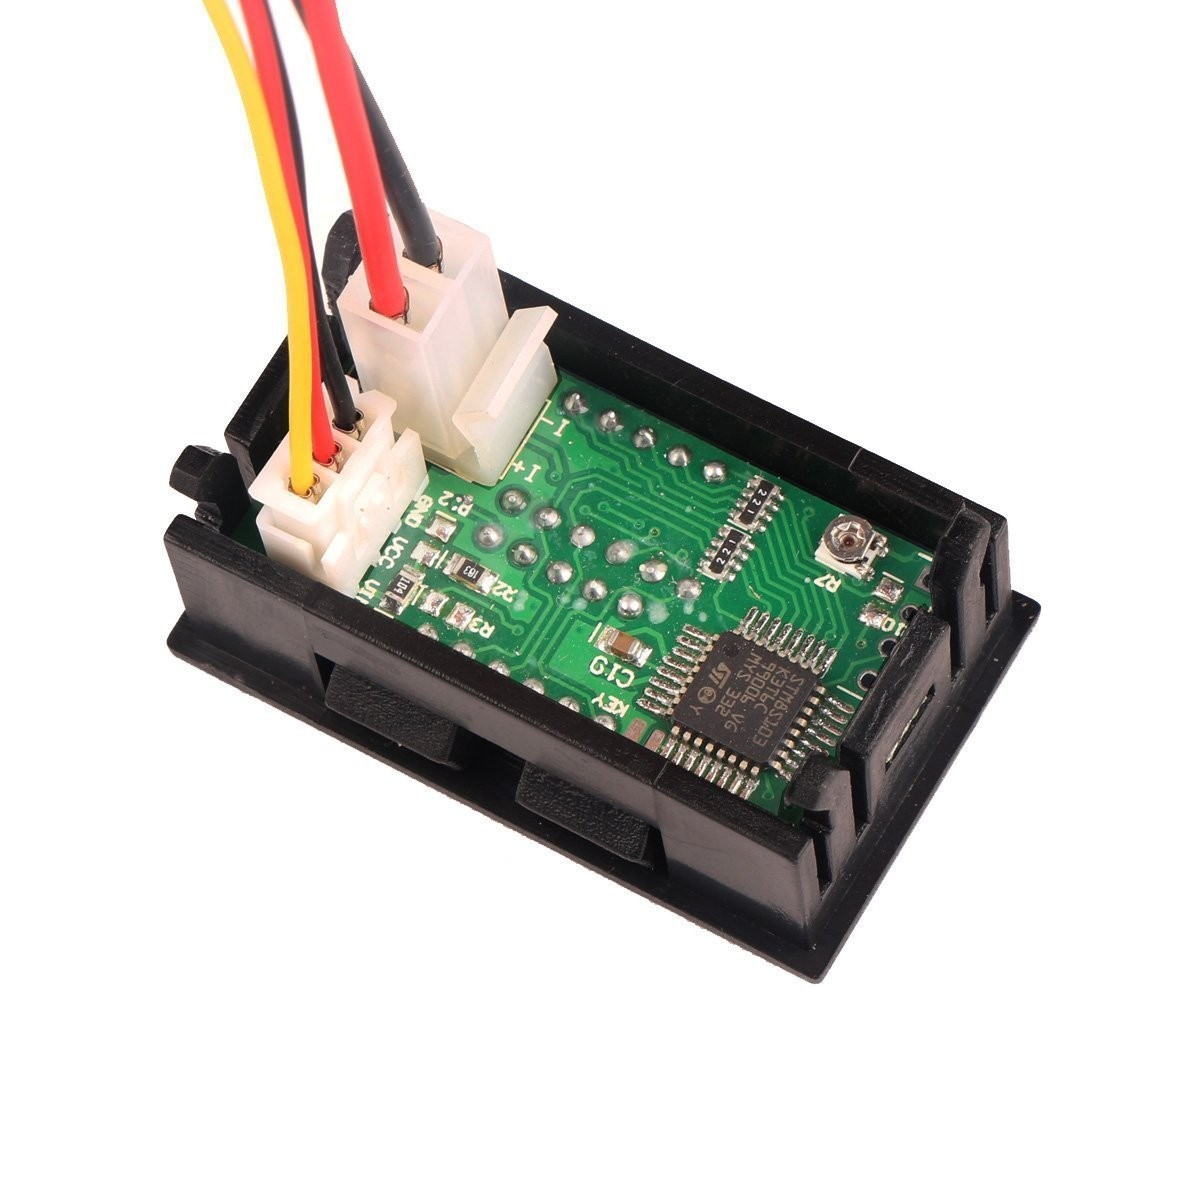 Riorand Dc Panel Voltmeter Amp Volt Power Meter 2in1 0 330v 1a Basic Motorcycle Wiring Diagram Lightbox Moreview